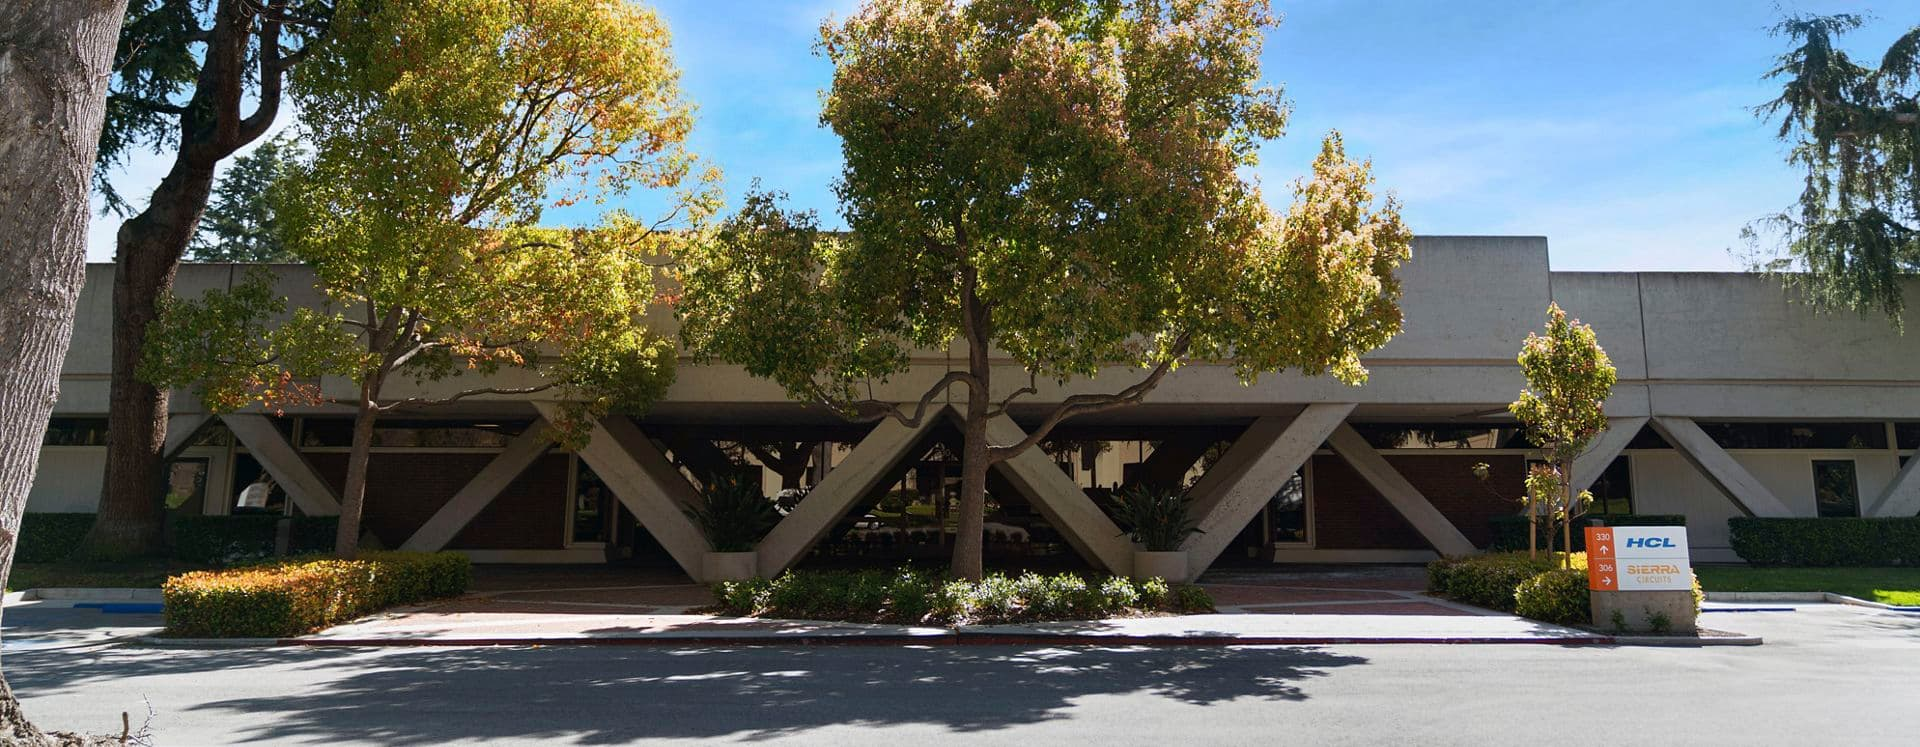 Exterior building photography of 306 Potrero Avenue in 306-320 Potrero / 870 Hermosa, in Sunnyvale, California.